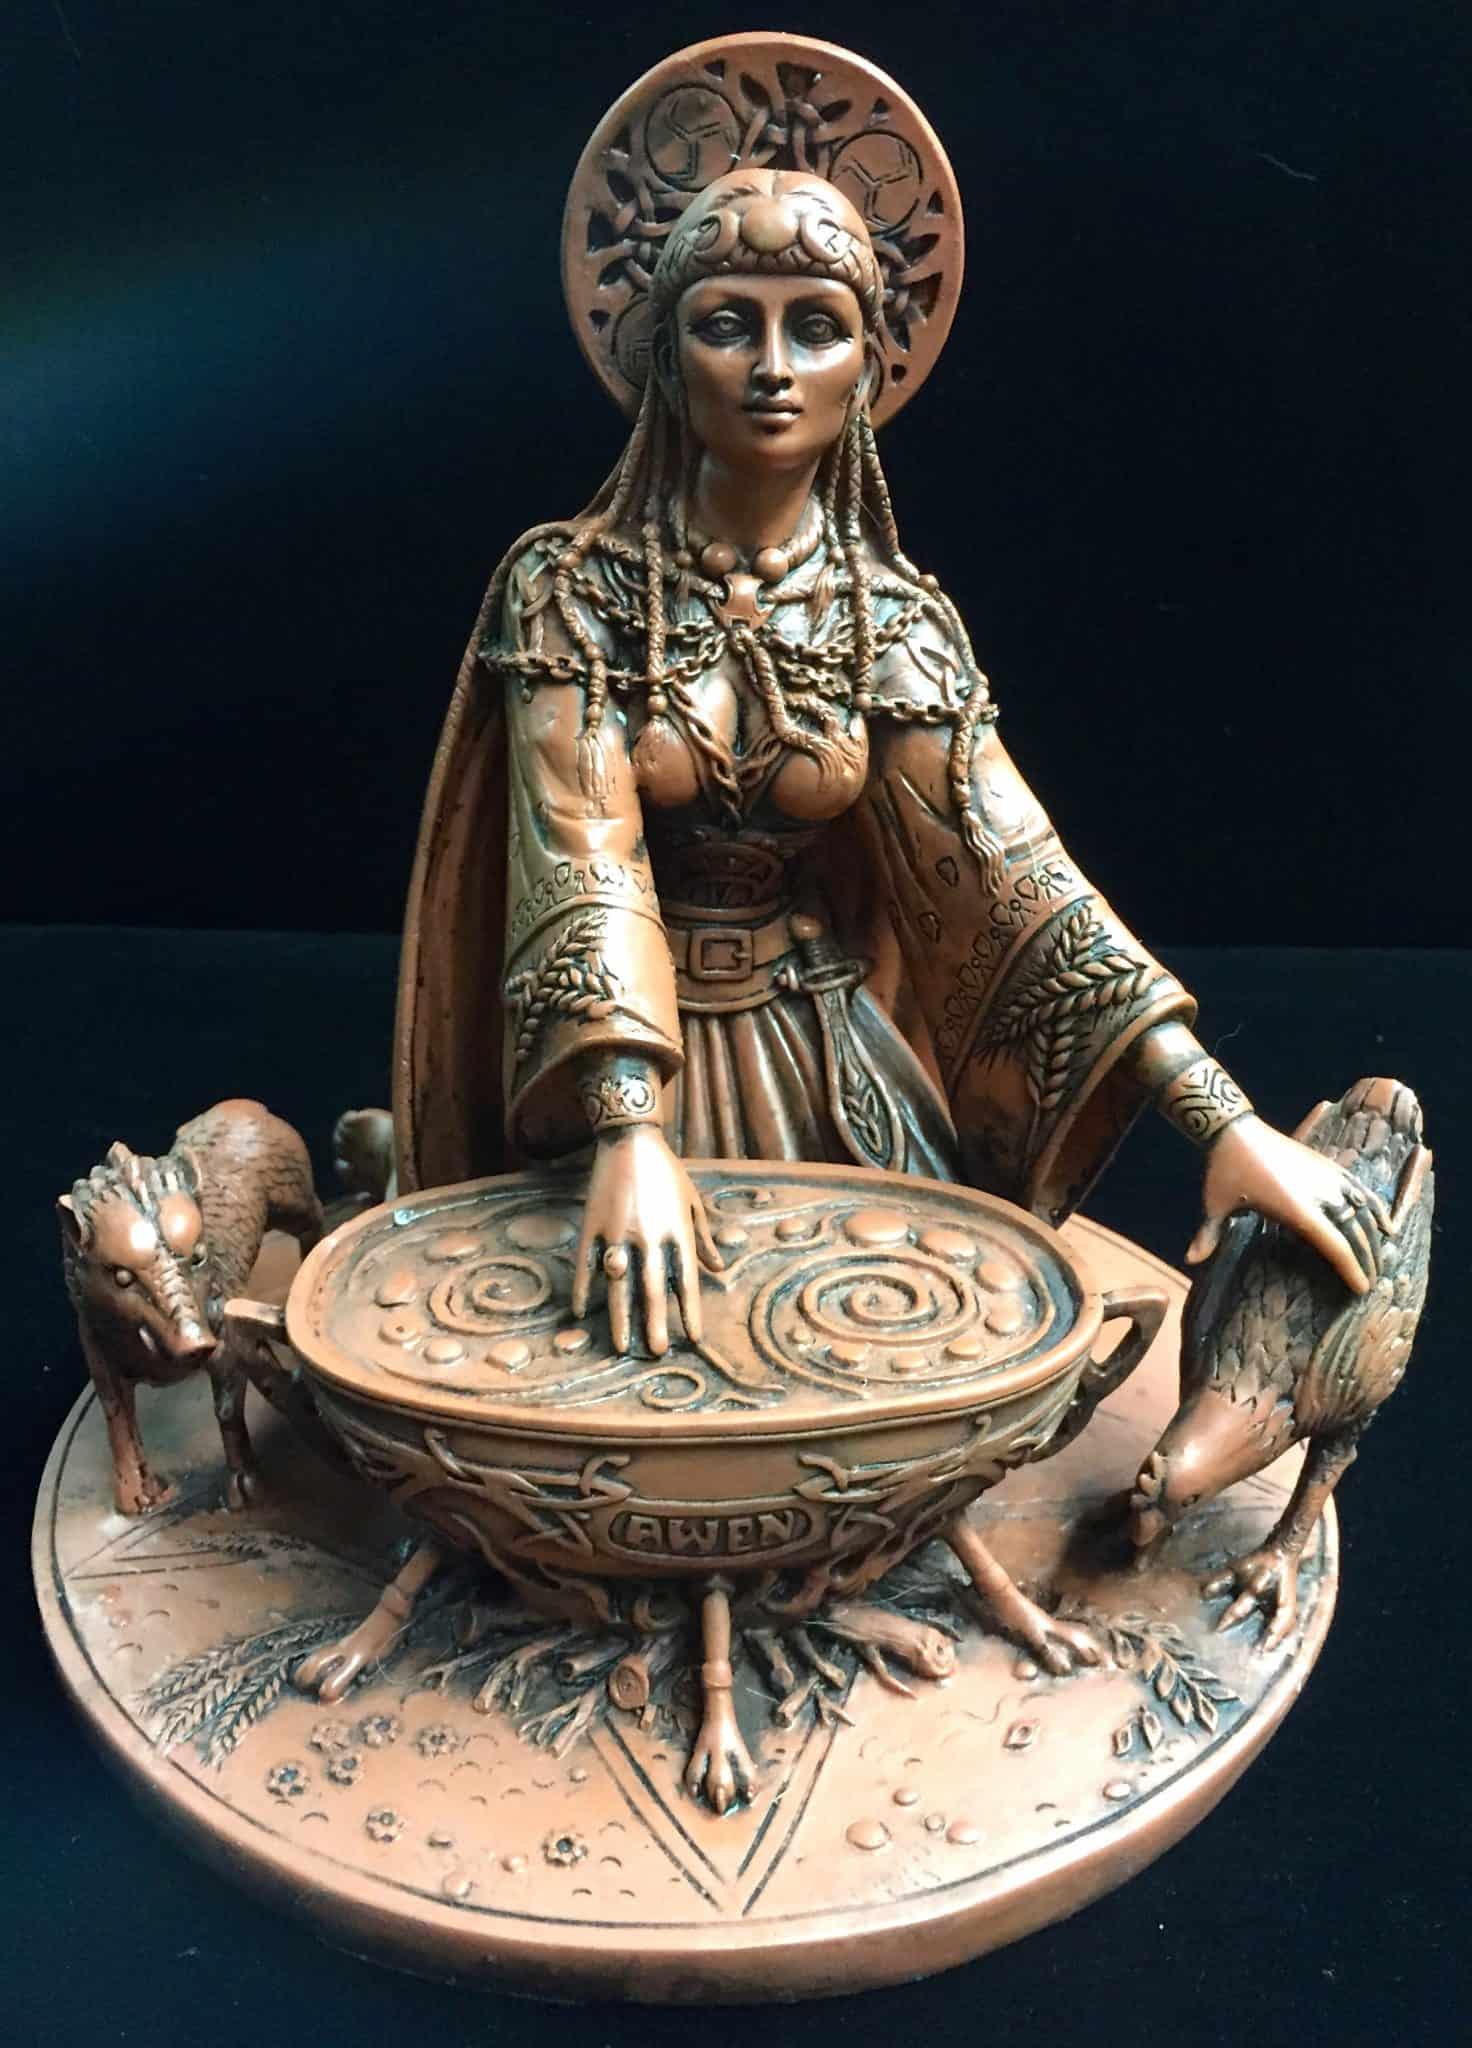 Celtic Crone Goddess Cerridwen Terracotta Resin Statue by Maxine Miller ©Maxine Miller - Front View